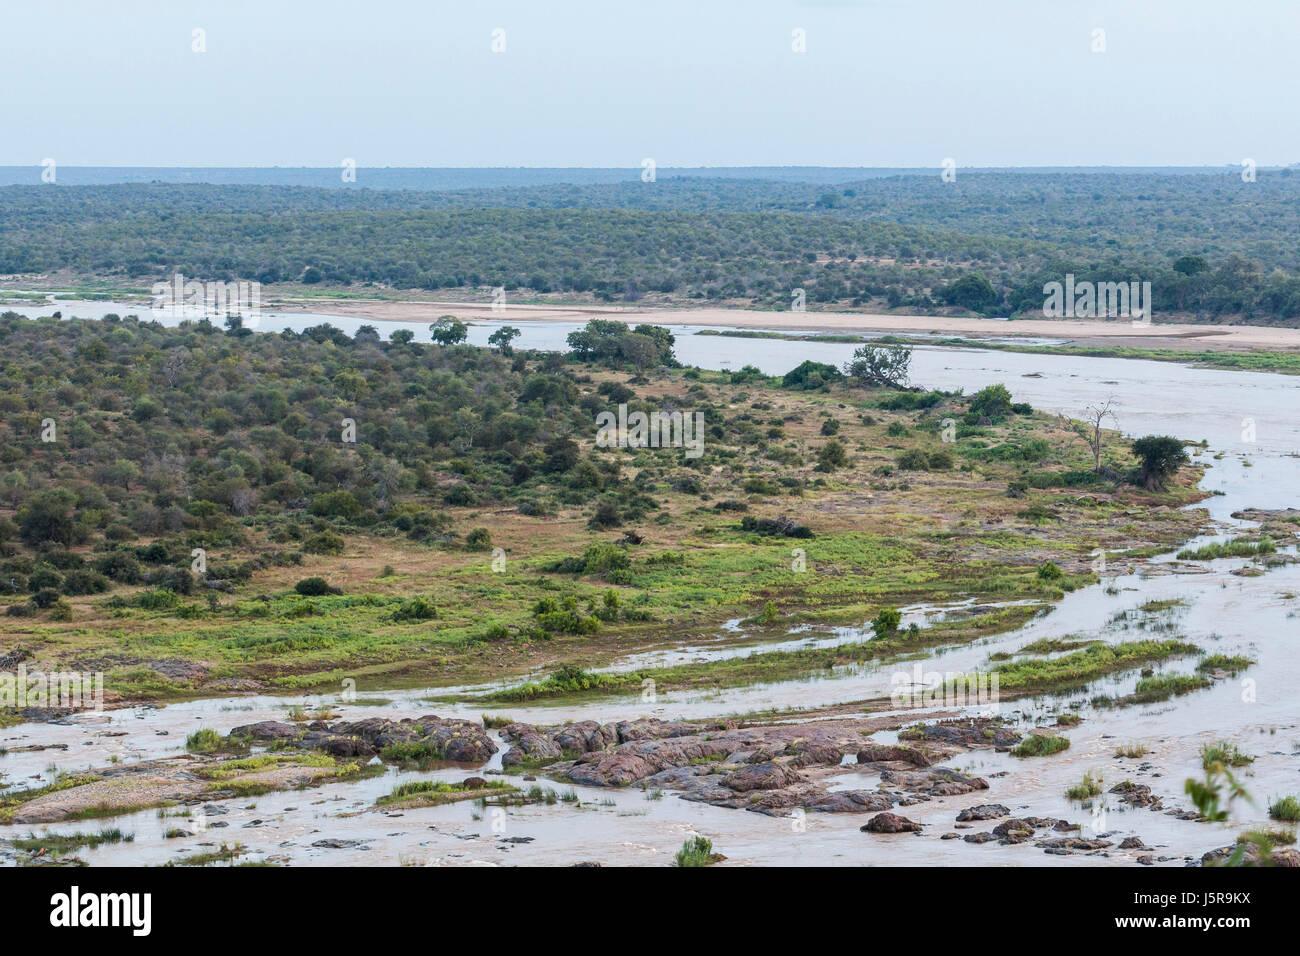 Olifants Camp view, Kruger Park, South Africa - Stock Image